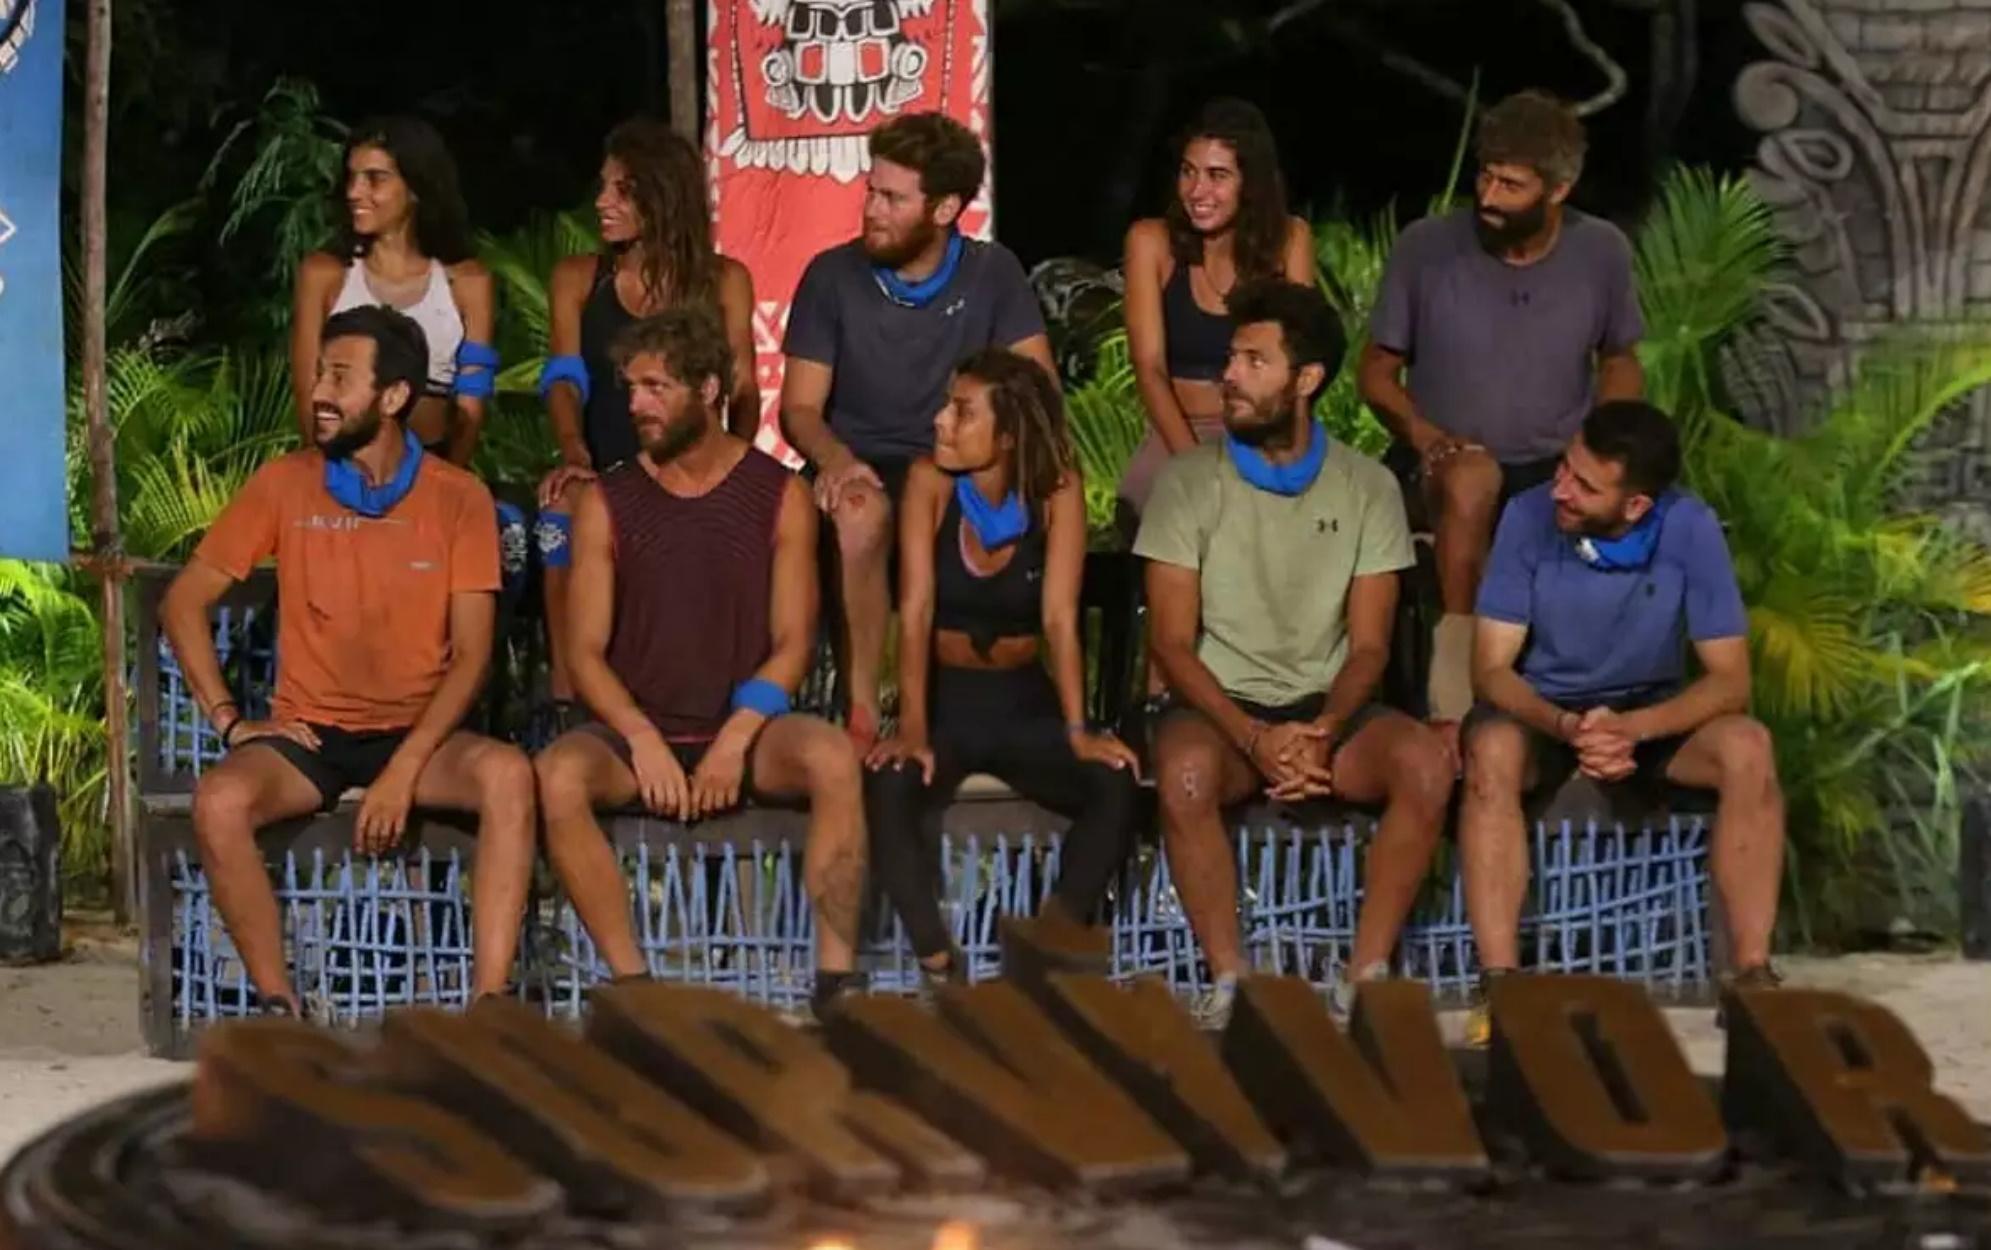 Survivor: Σενάρια για ειδύλλιο, ποιοί παίκτες της μπλε ομάδας έγιναν ζευγάρι